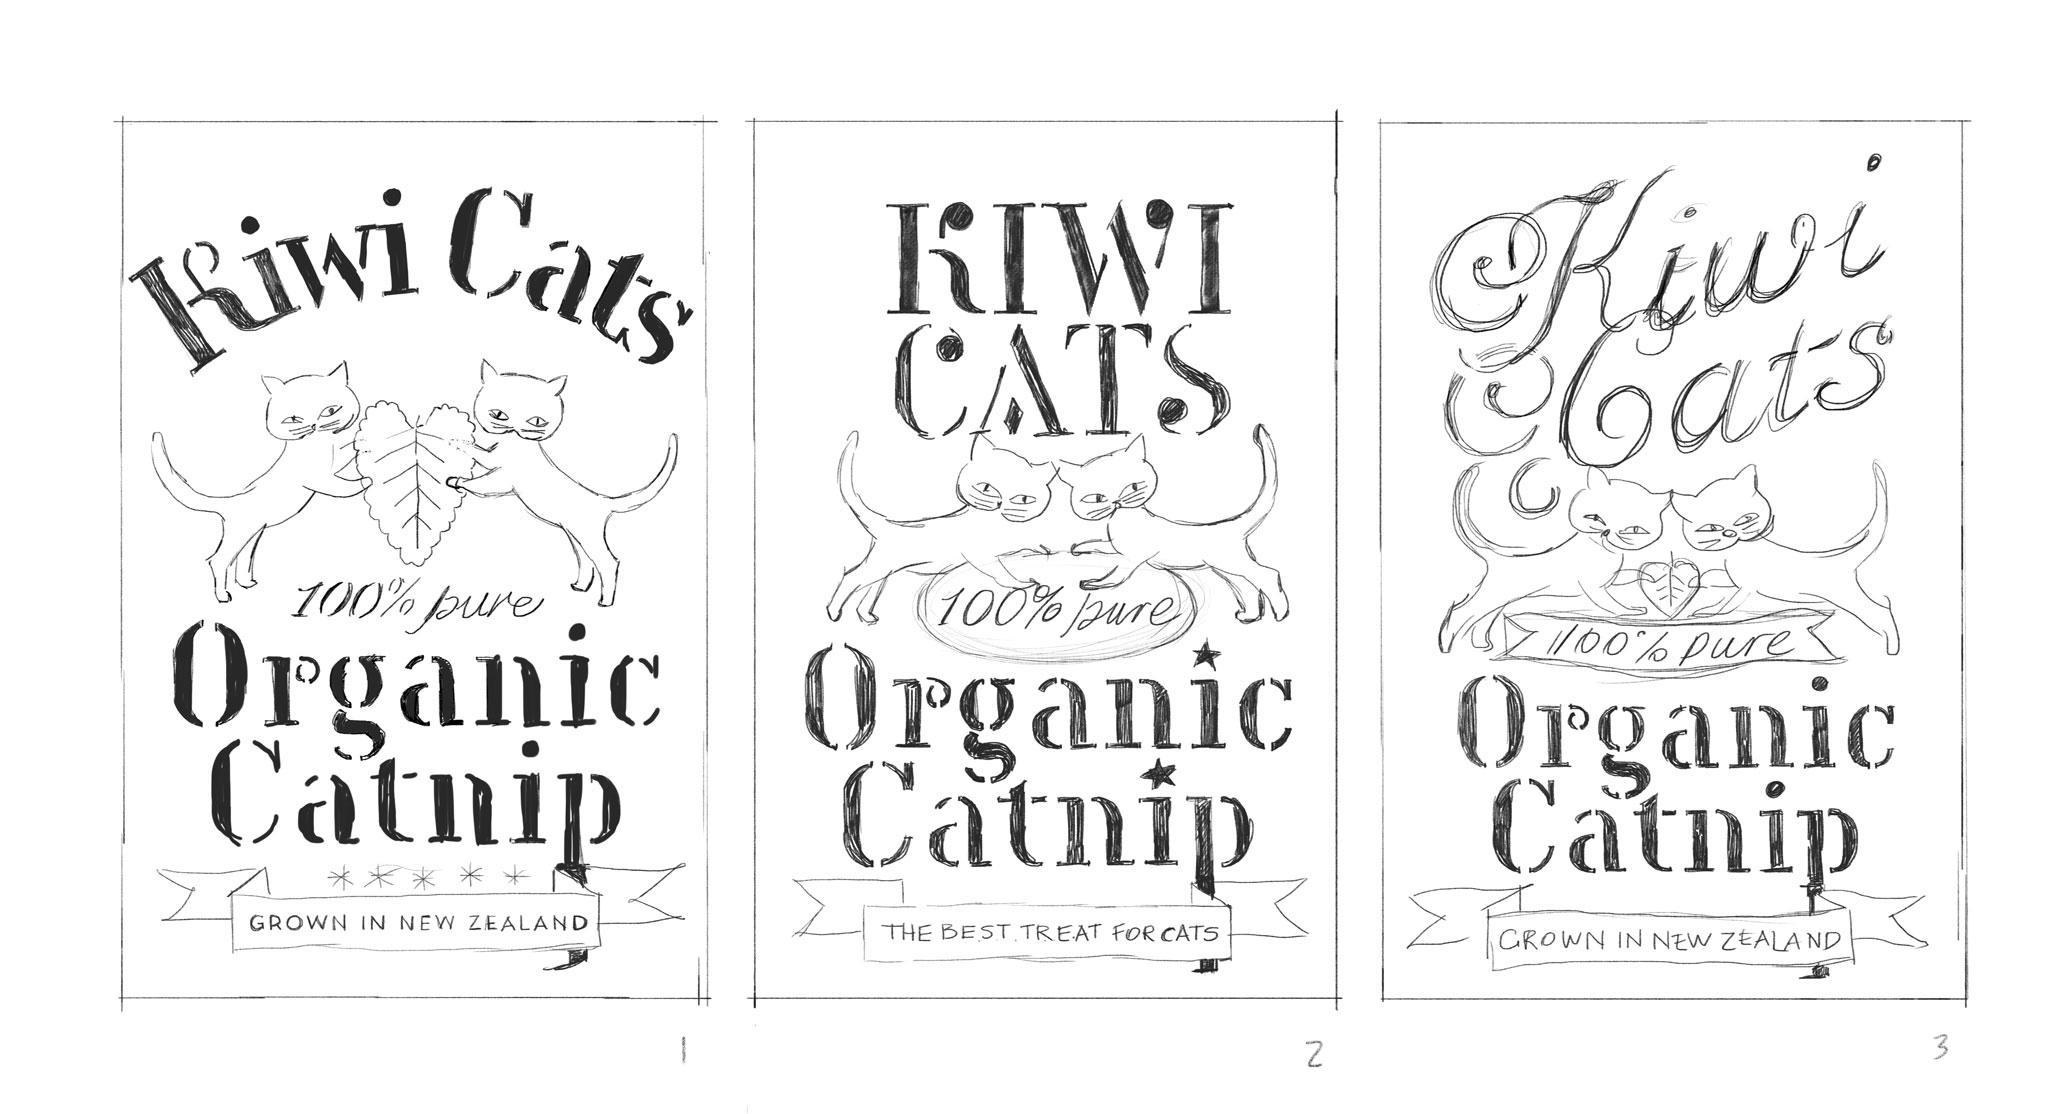 Organic Catnip Label - image 5 - student project